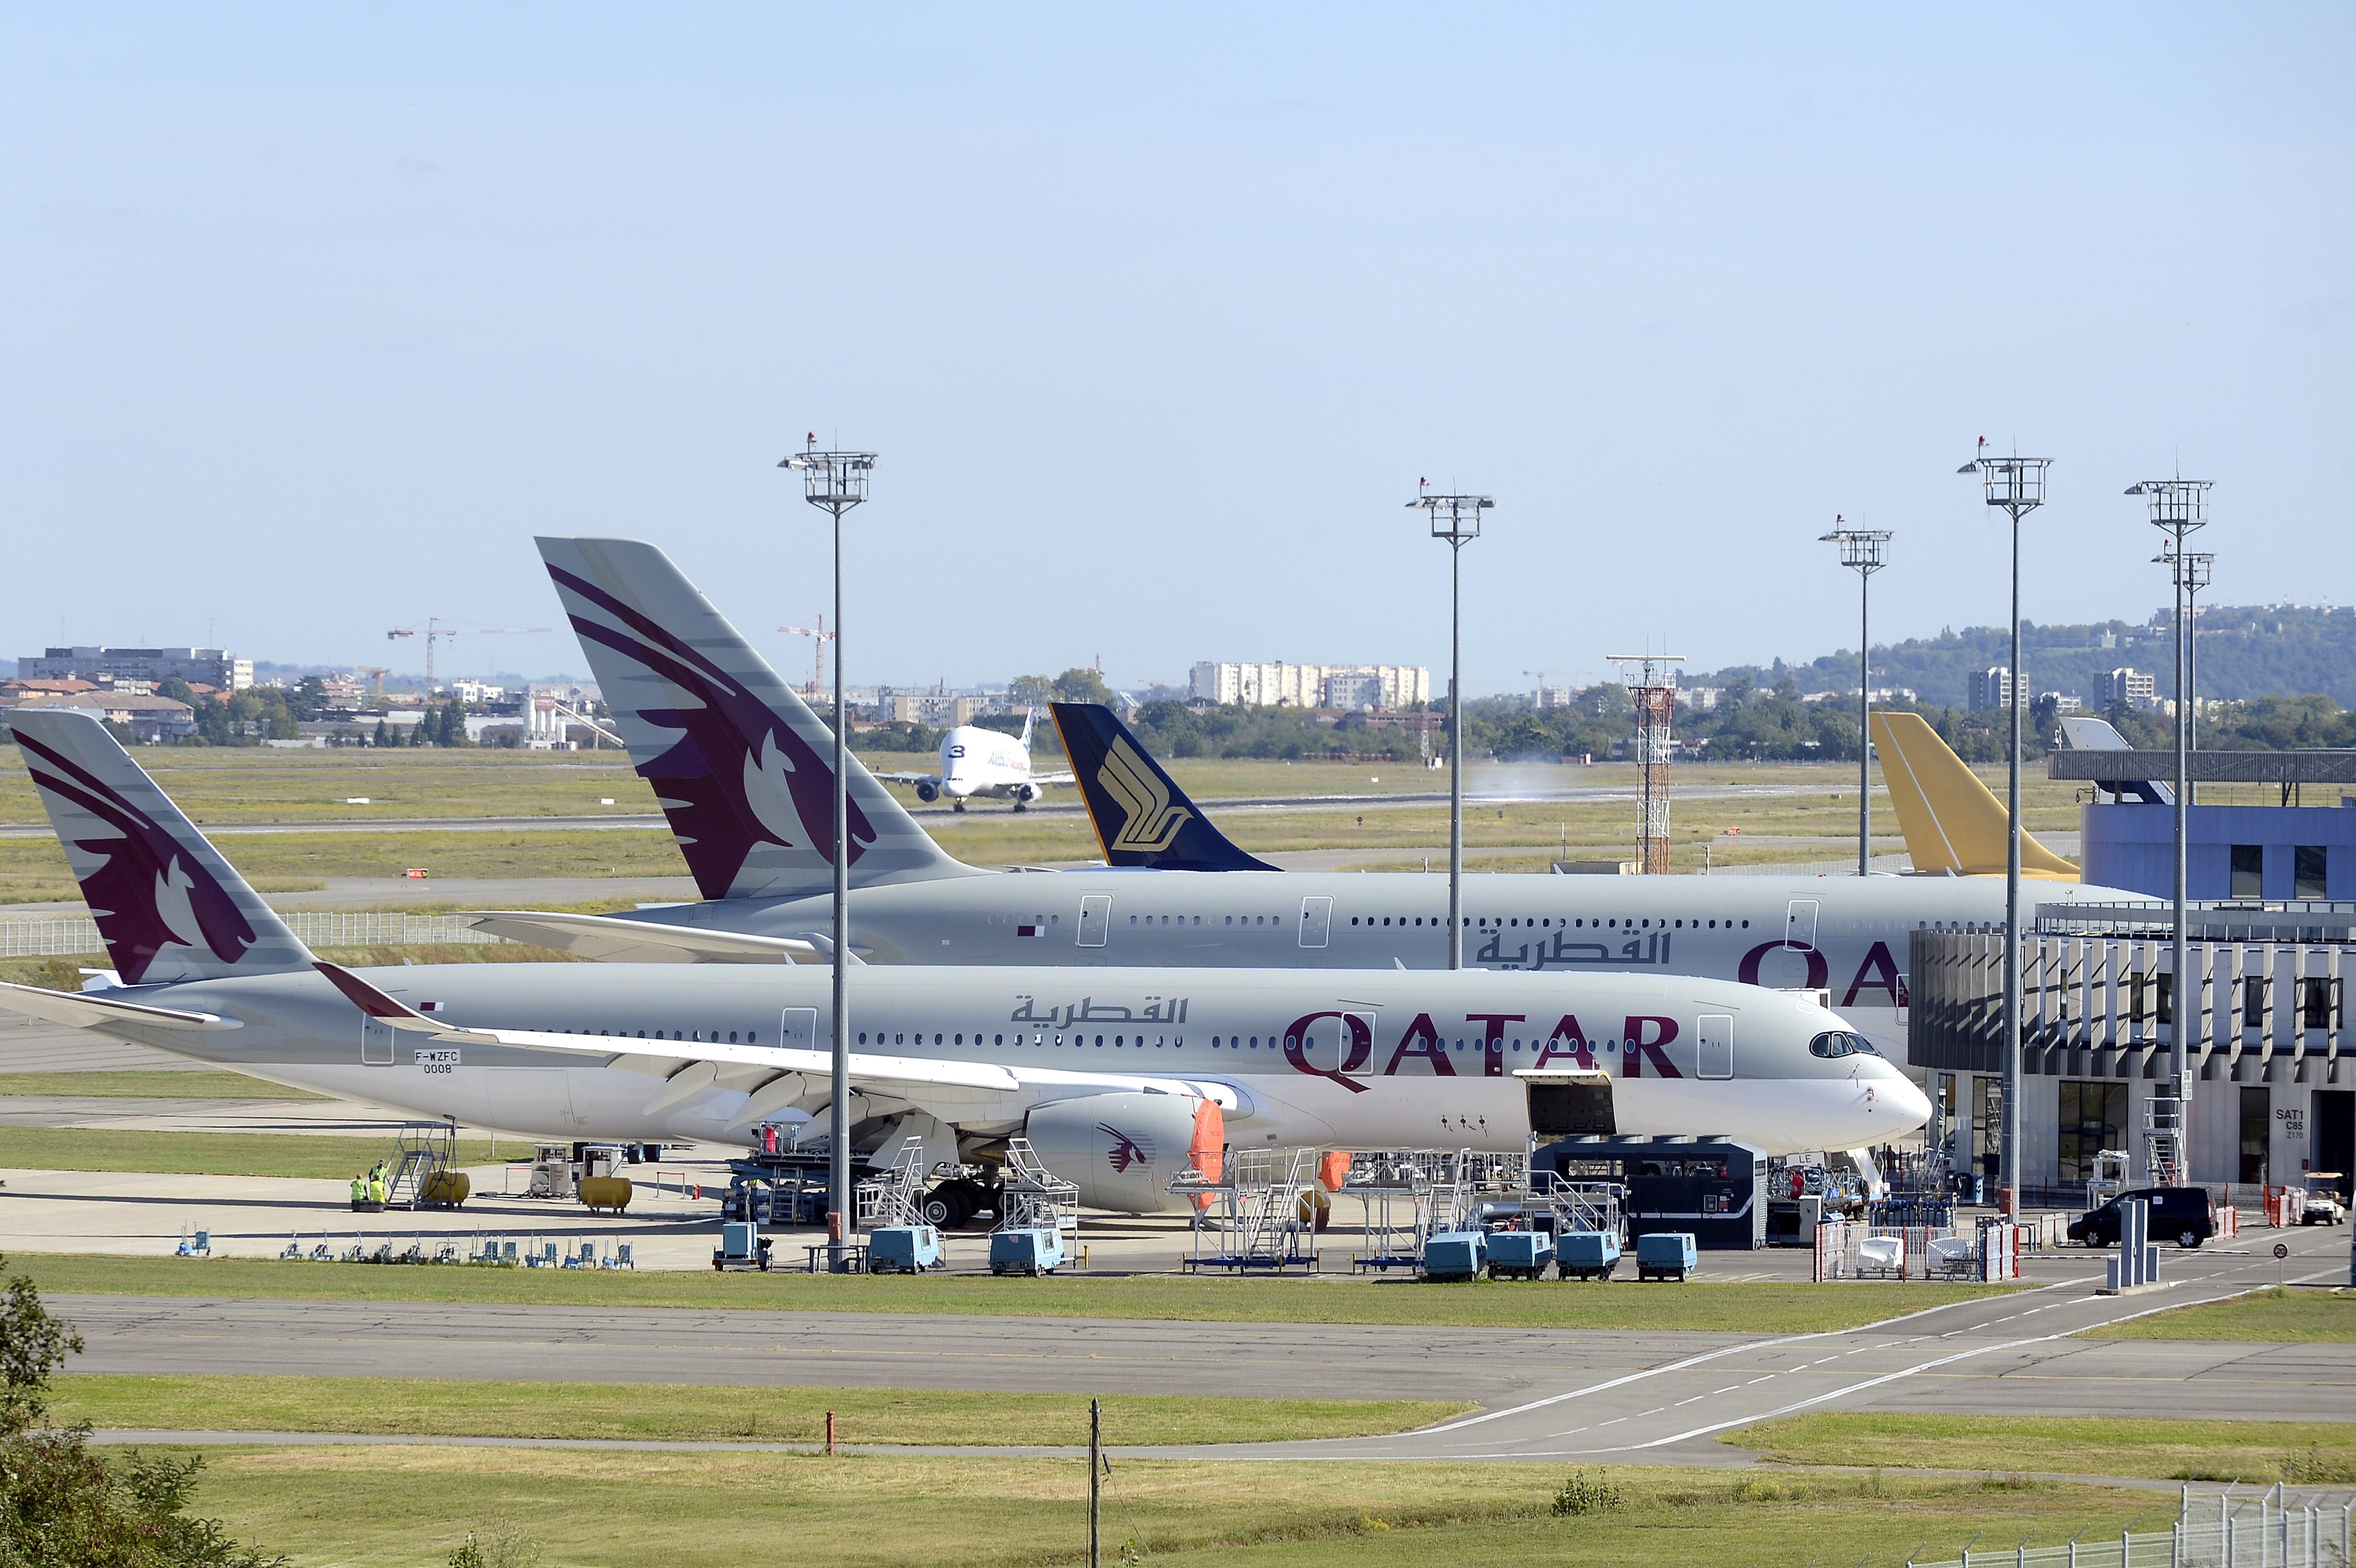 FRANCE-QATAR-ECONOMY-AIRBUS